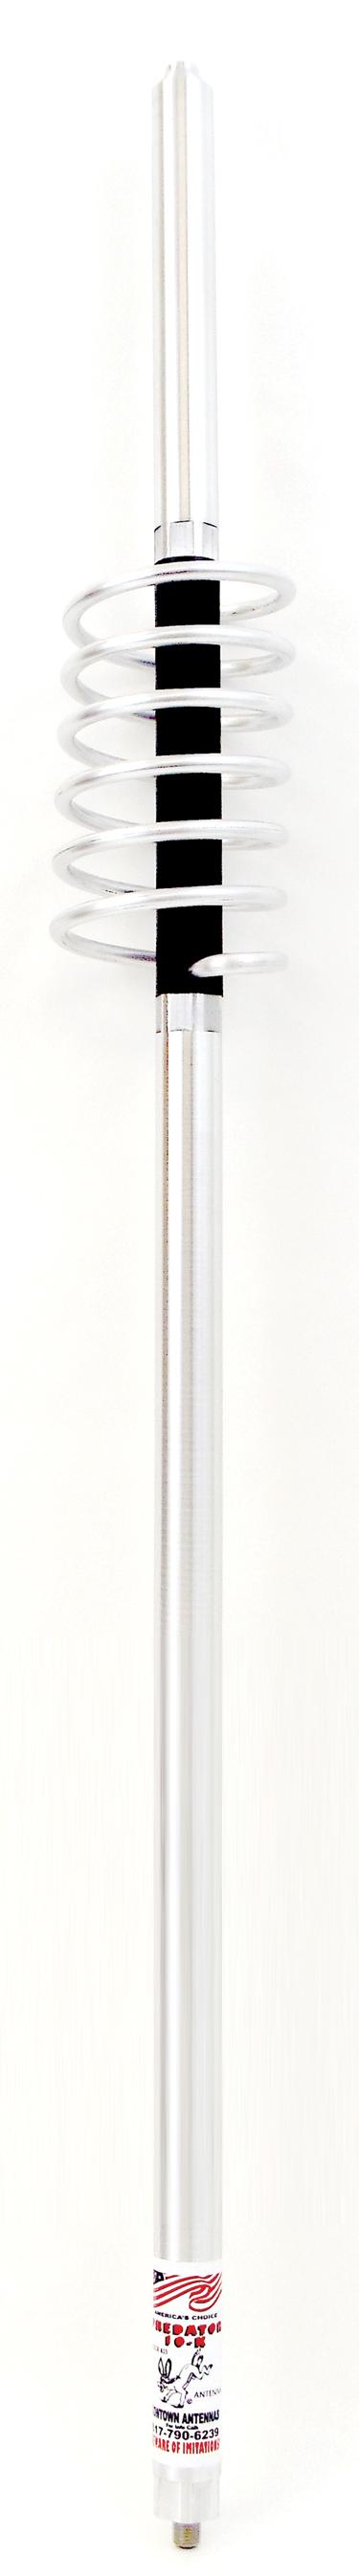 "K127 - 10,000 Watt Predator Antenna 3/8"" x 24"" Thread, 27"" Shaft, 58"" Whip"